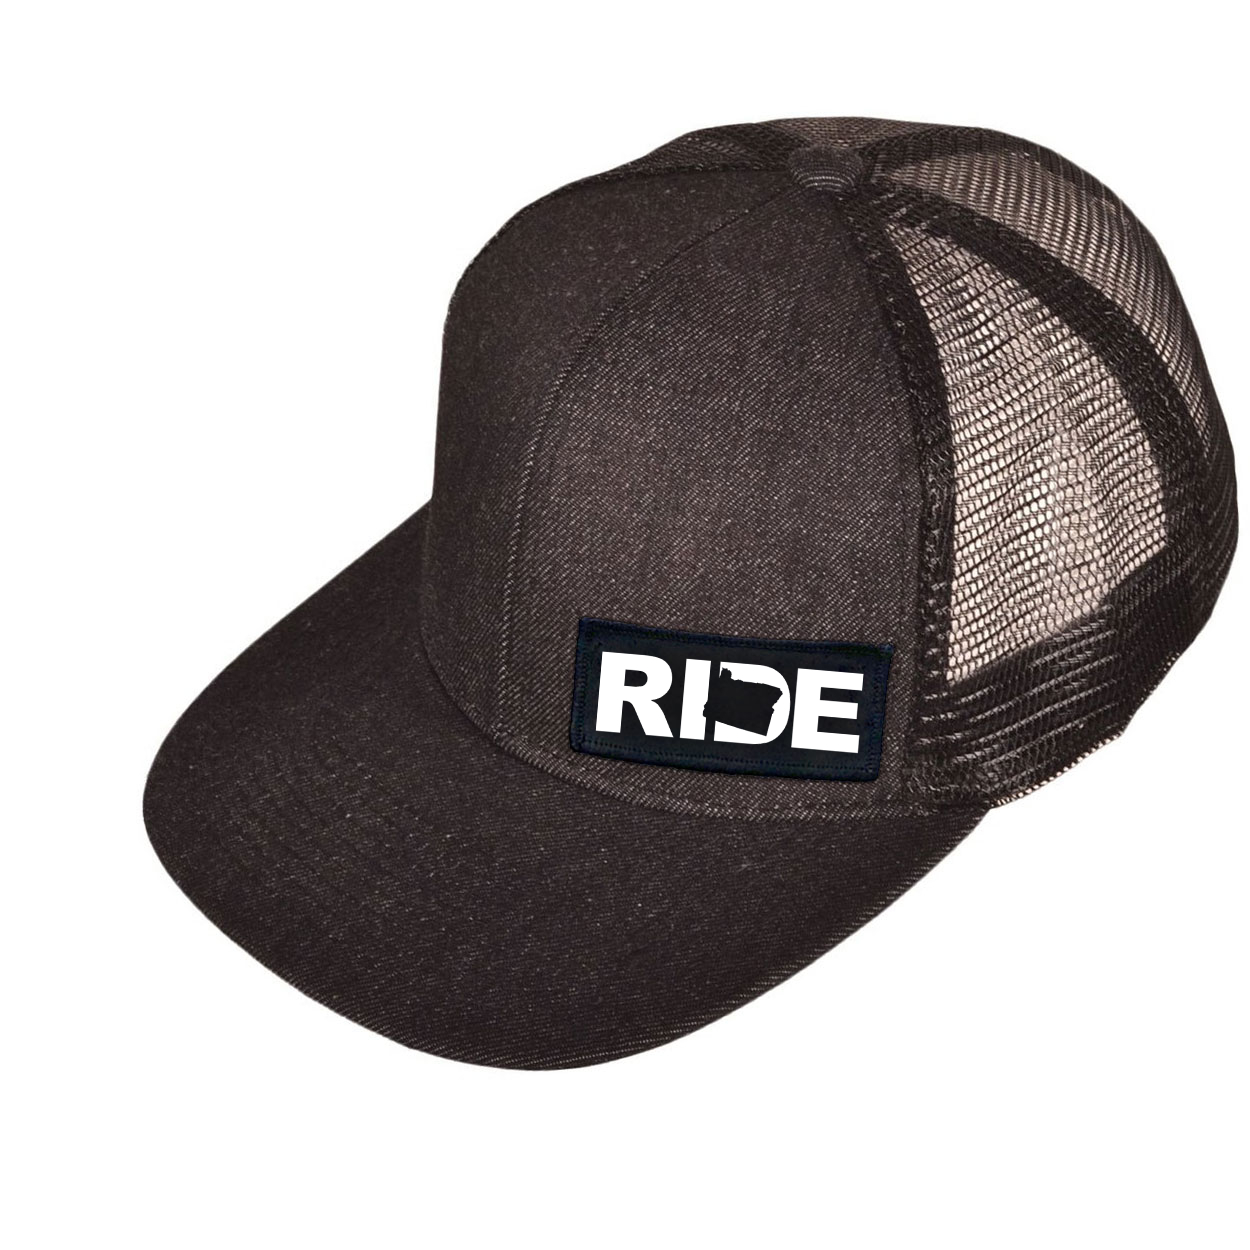 Ride Oregon Night Out Woven Patch Snapback Flat Brim Hat Black Denim (White Logo)